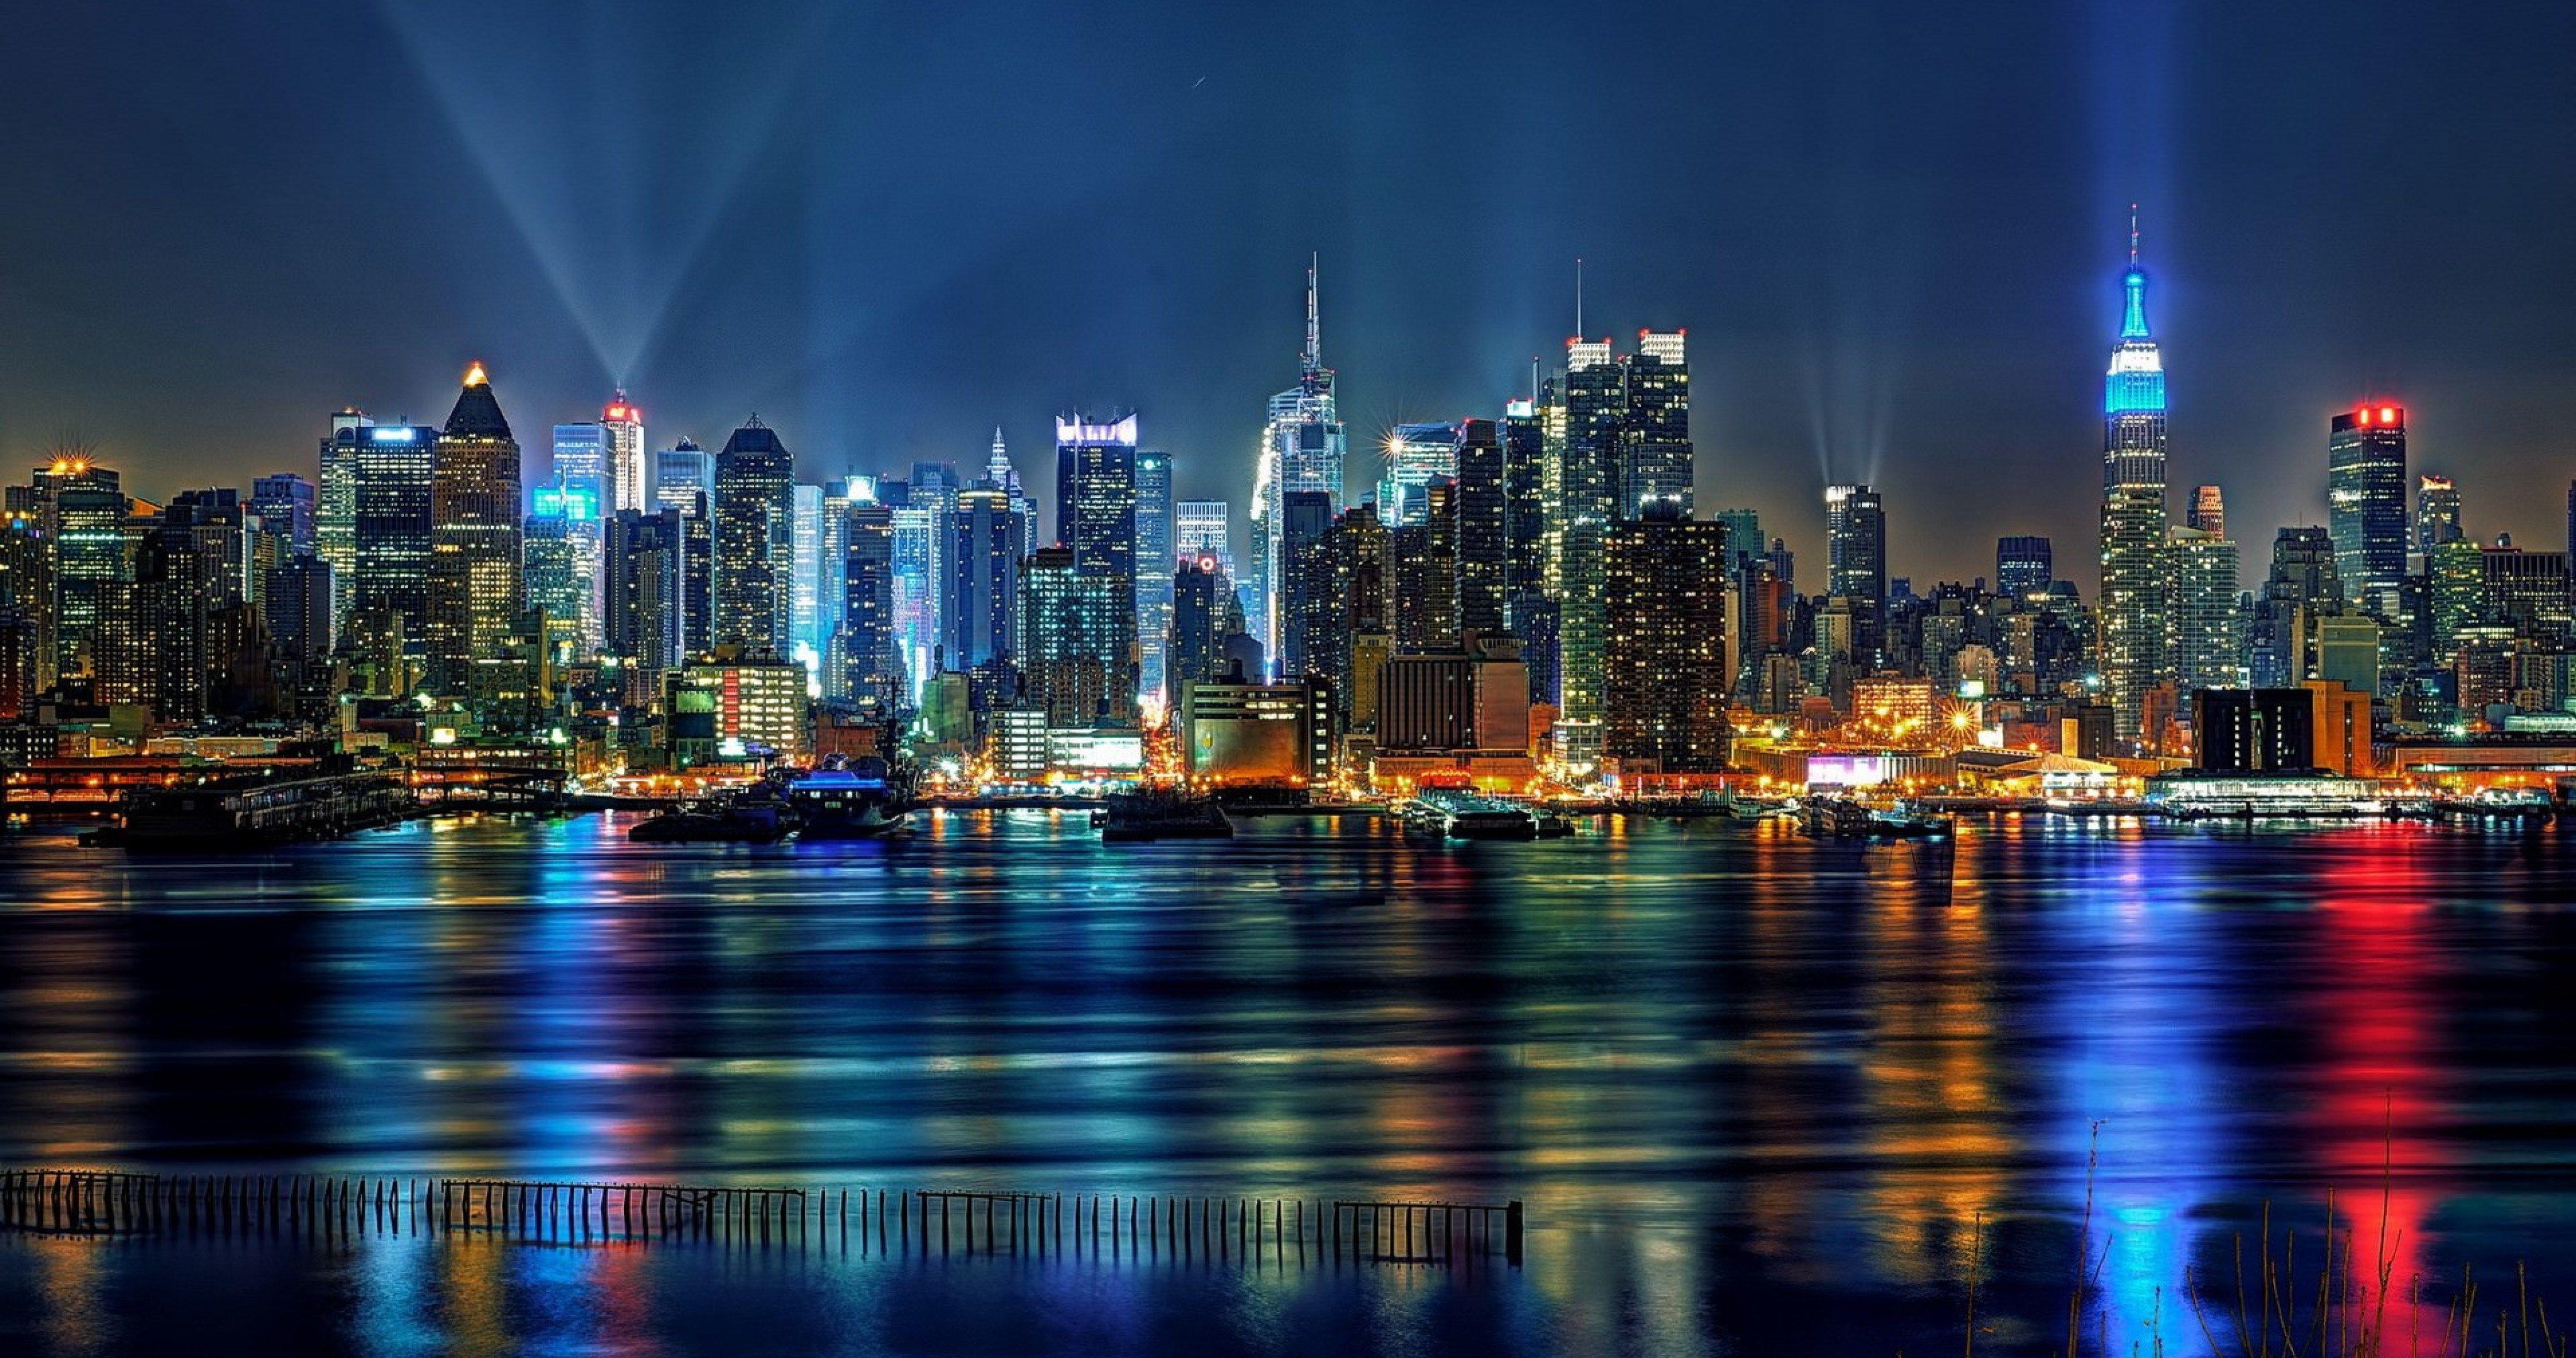 4K Ultra HD City Wallpapers - Top Free 4K Ultra HD City ...